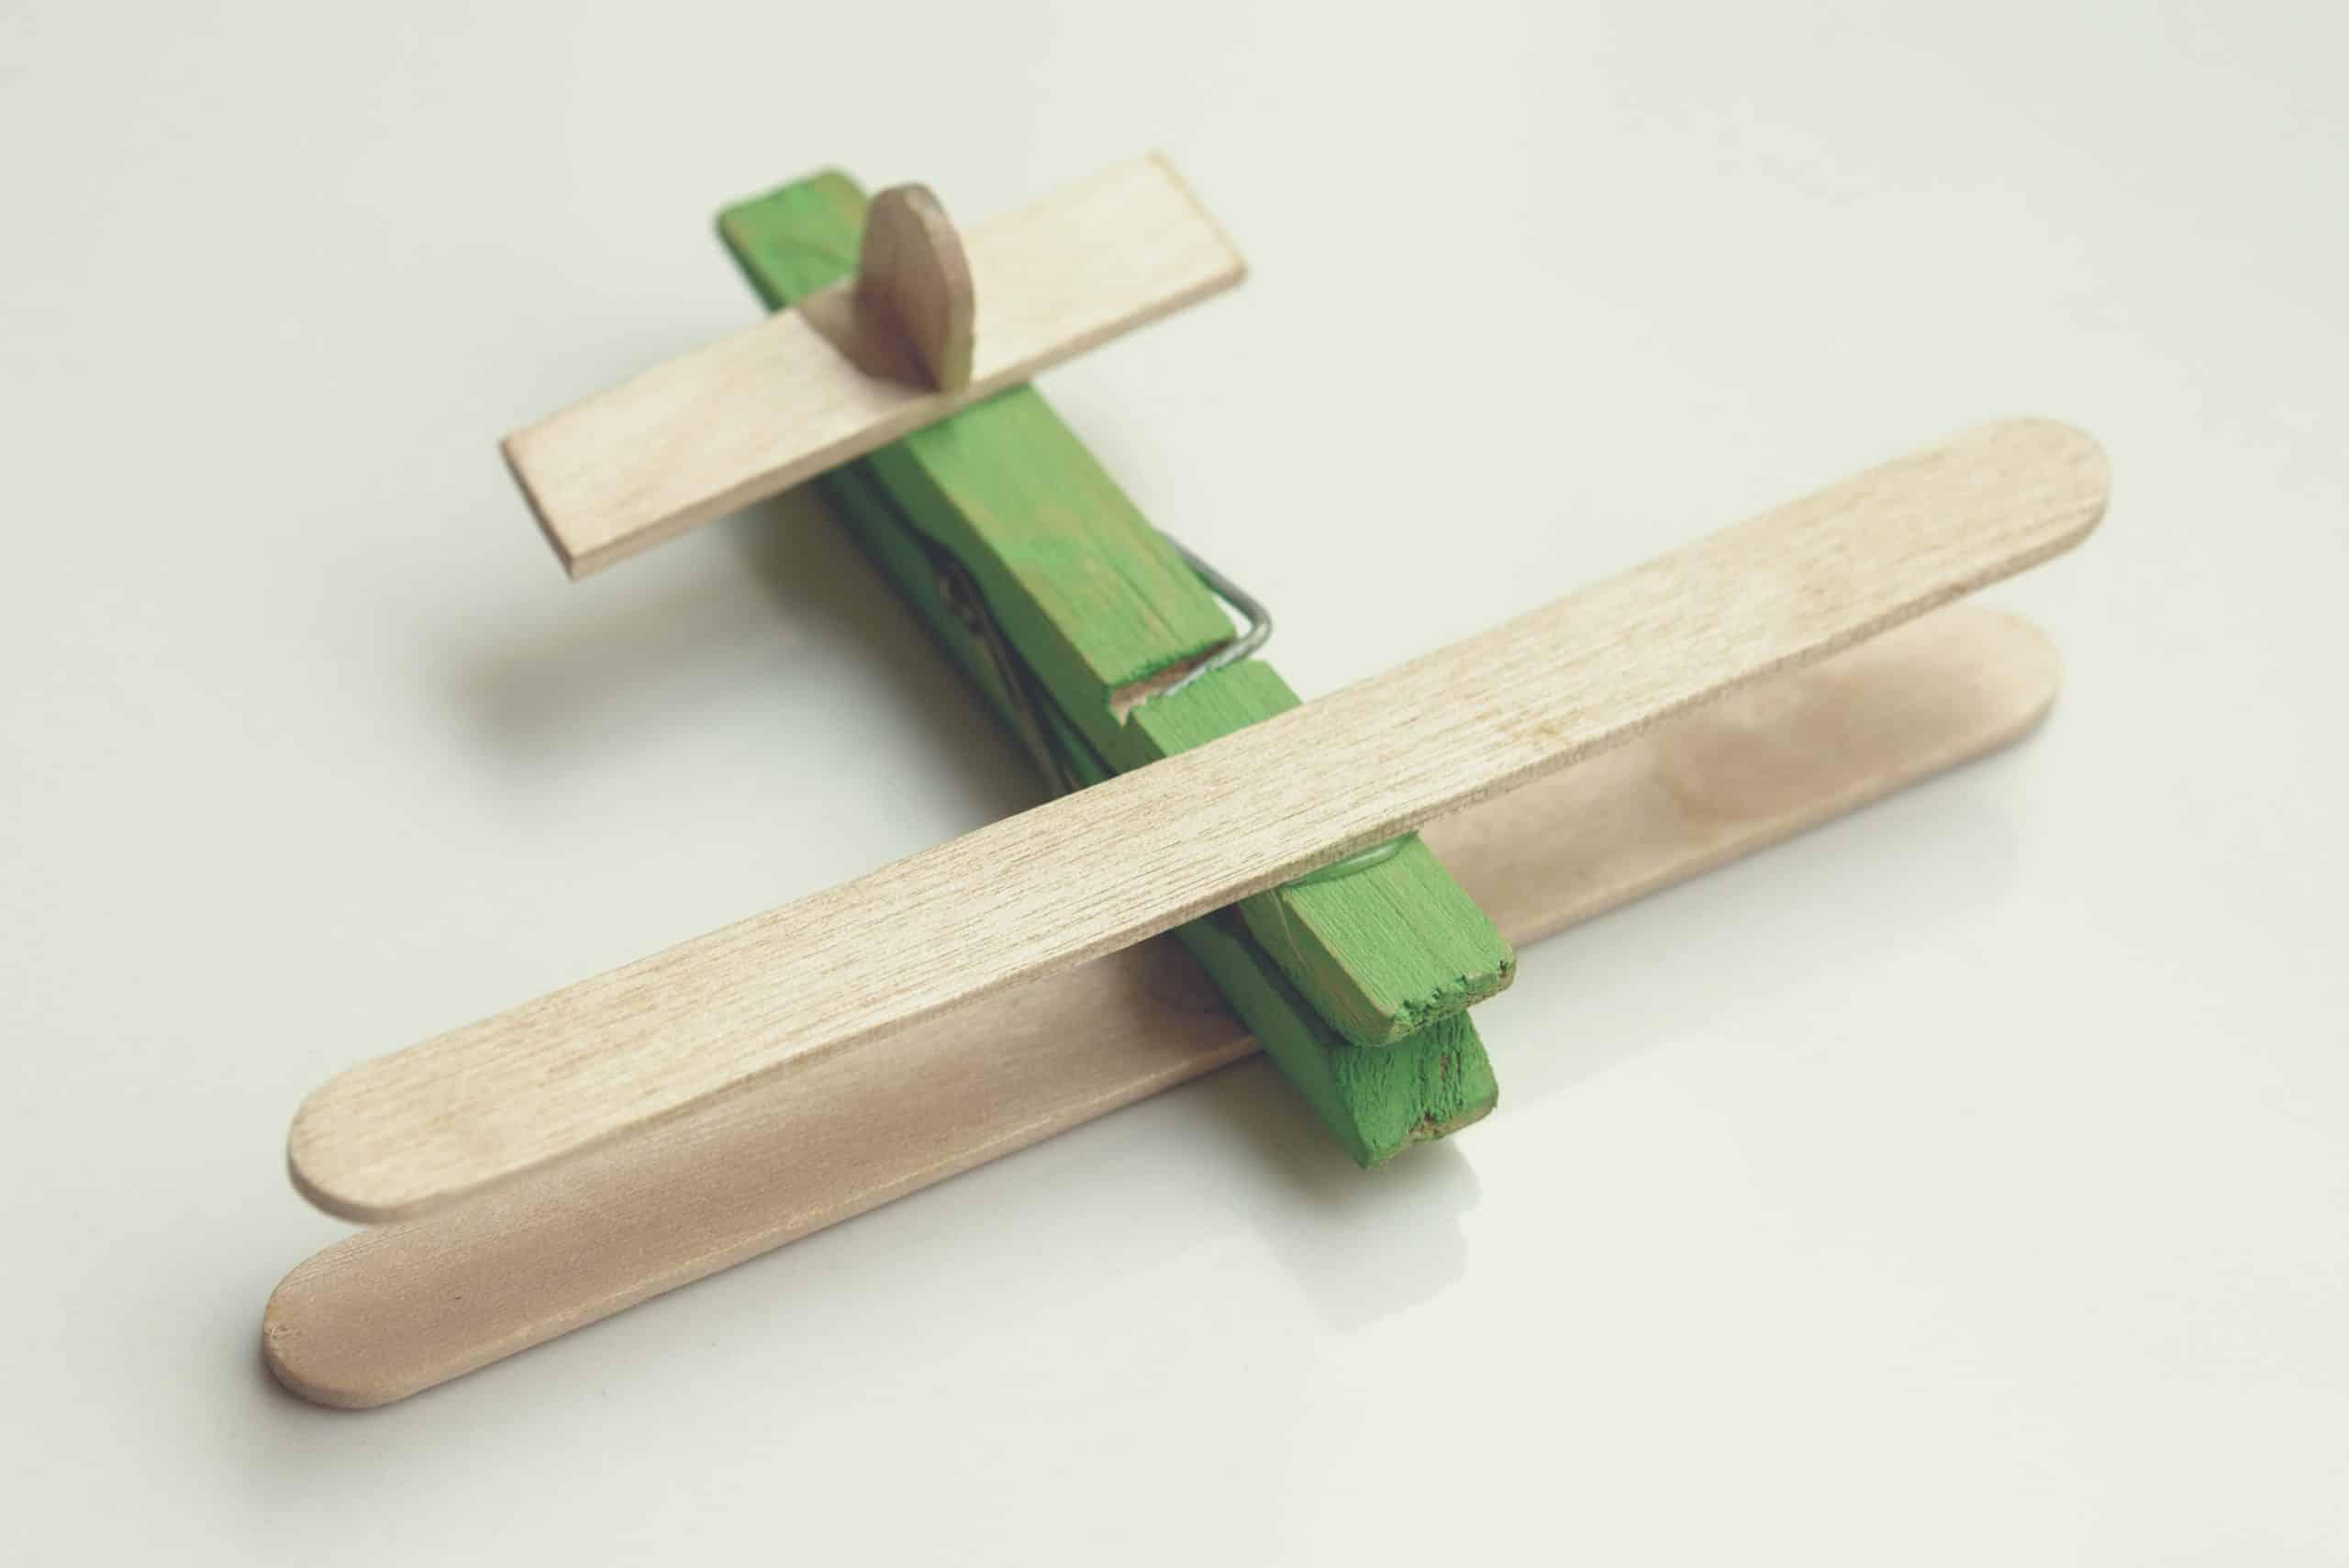 popsicle stick biplane